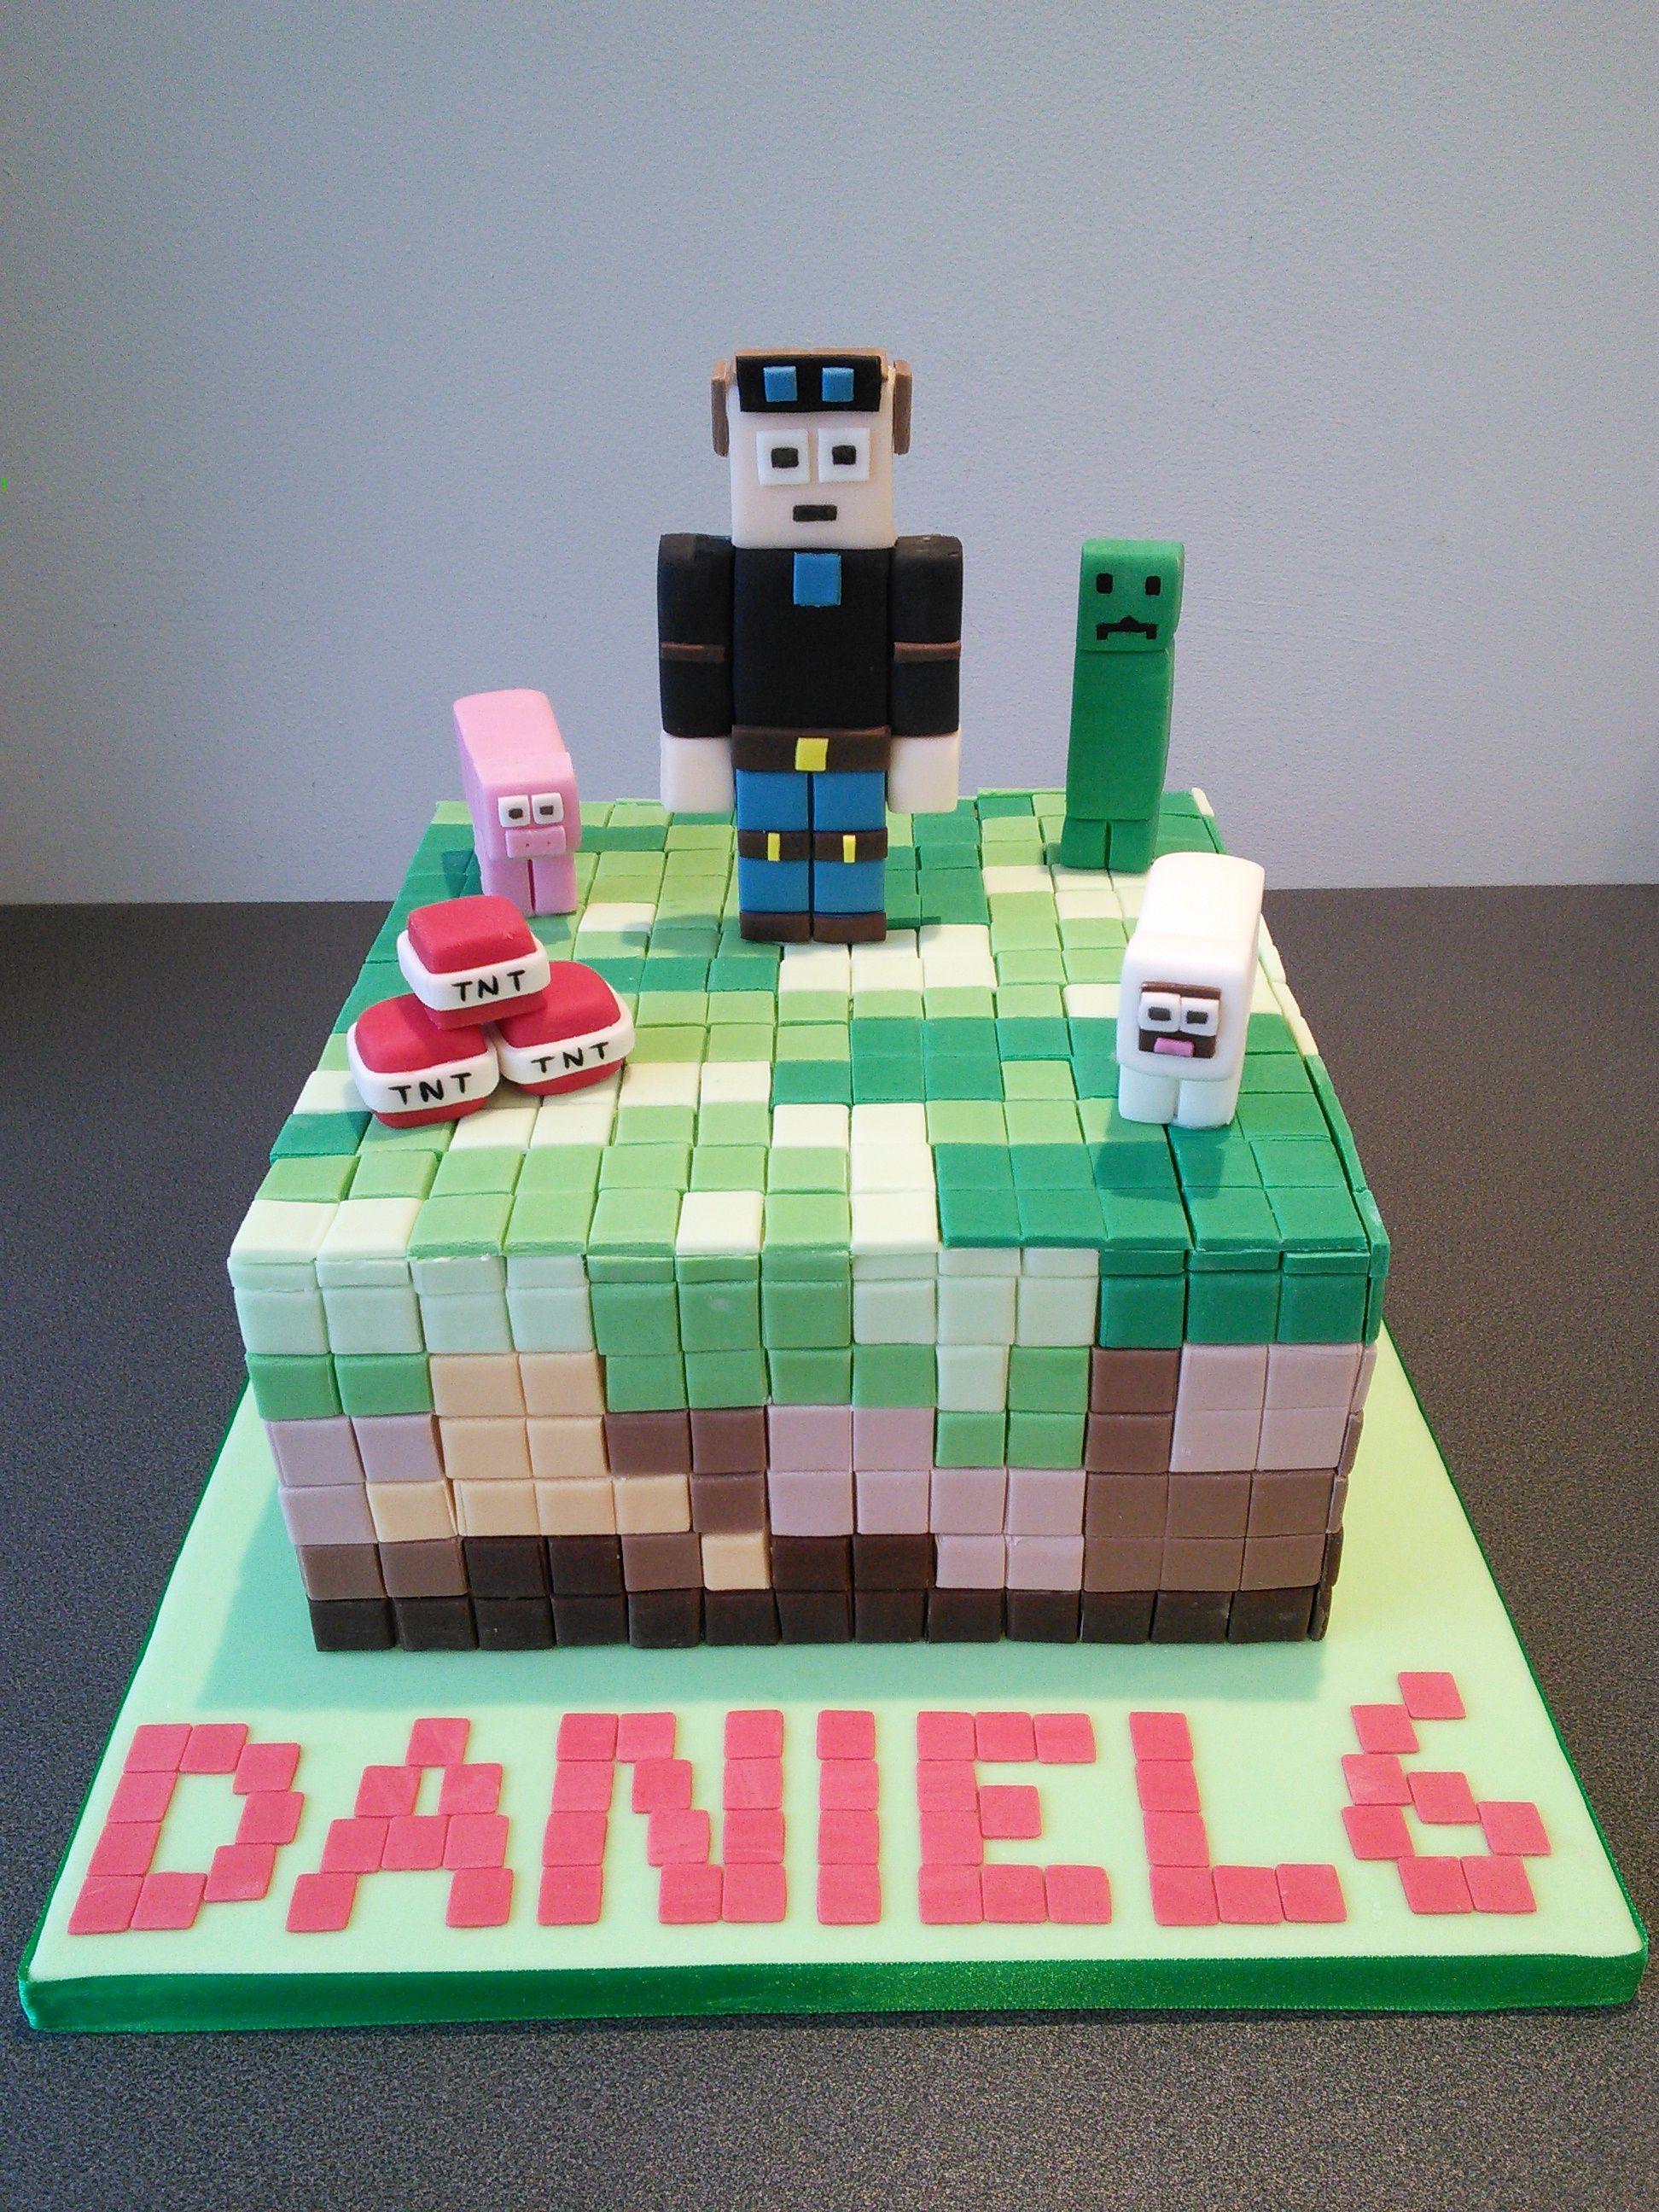 Minecraft Birthday Cake With Dan Tdn Tnt Sheep Pig And Creeper